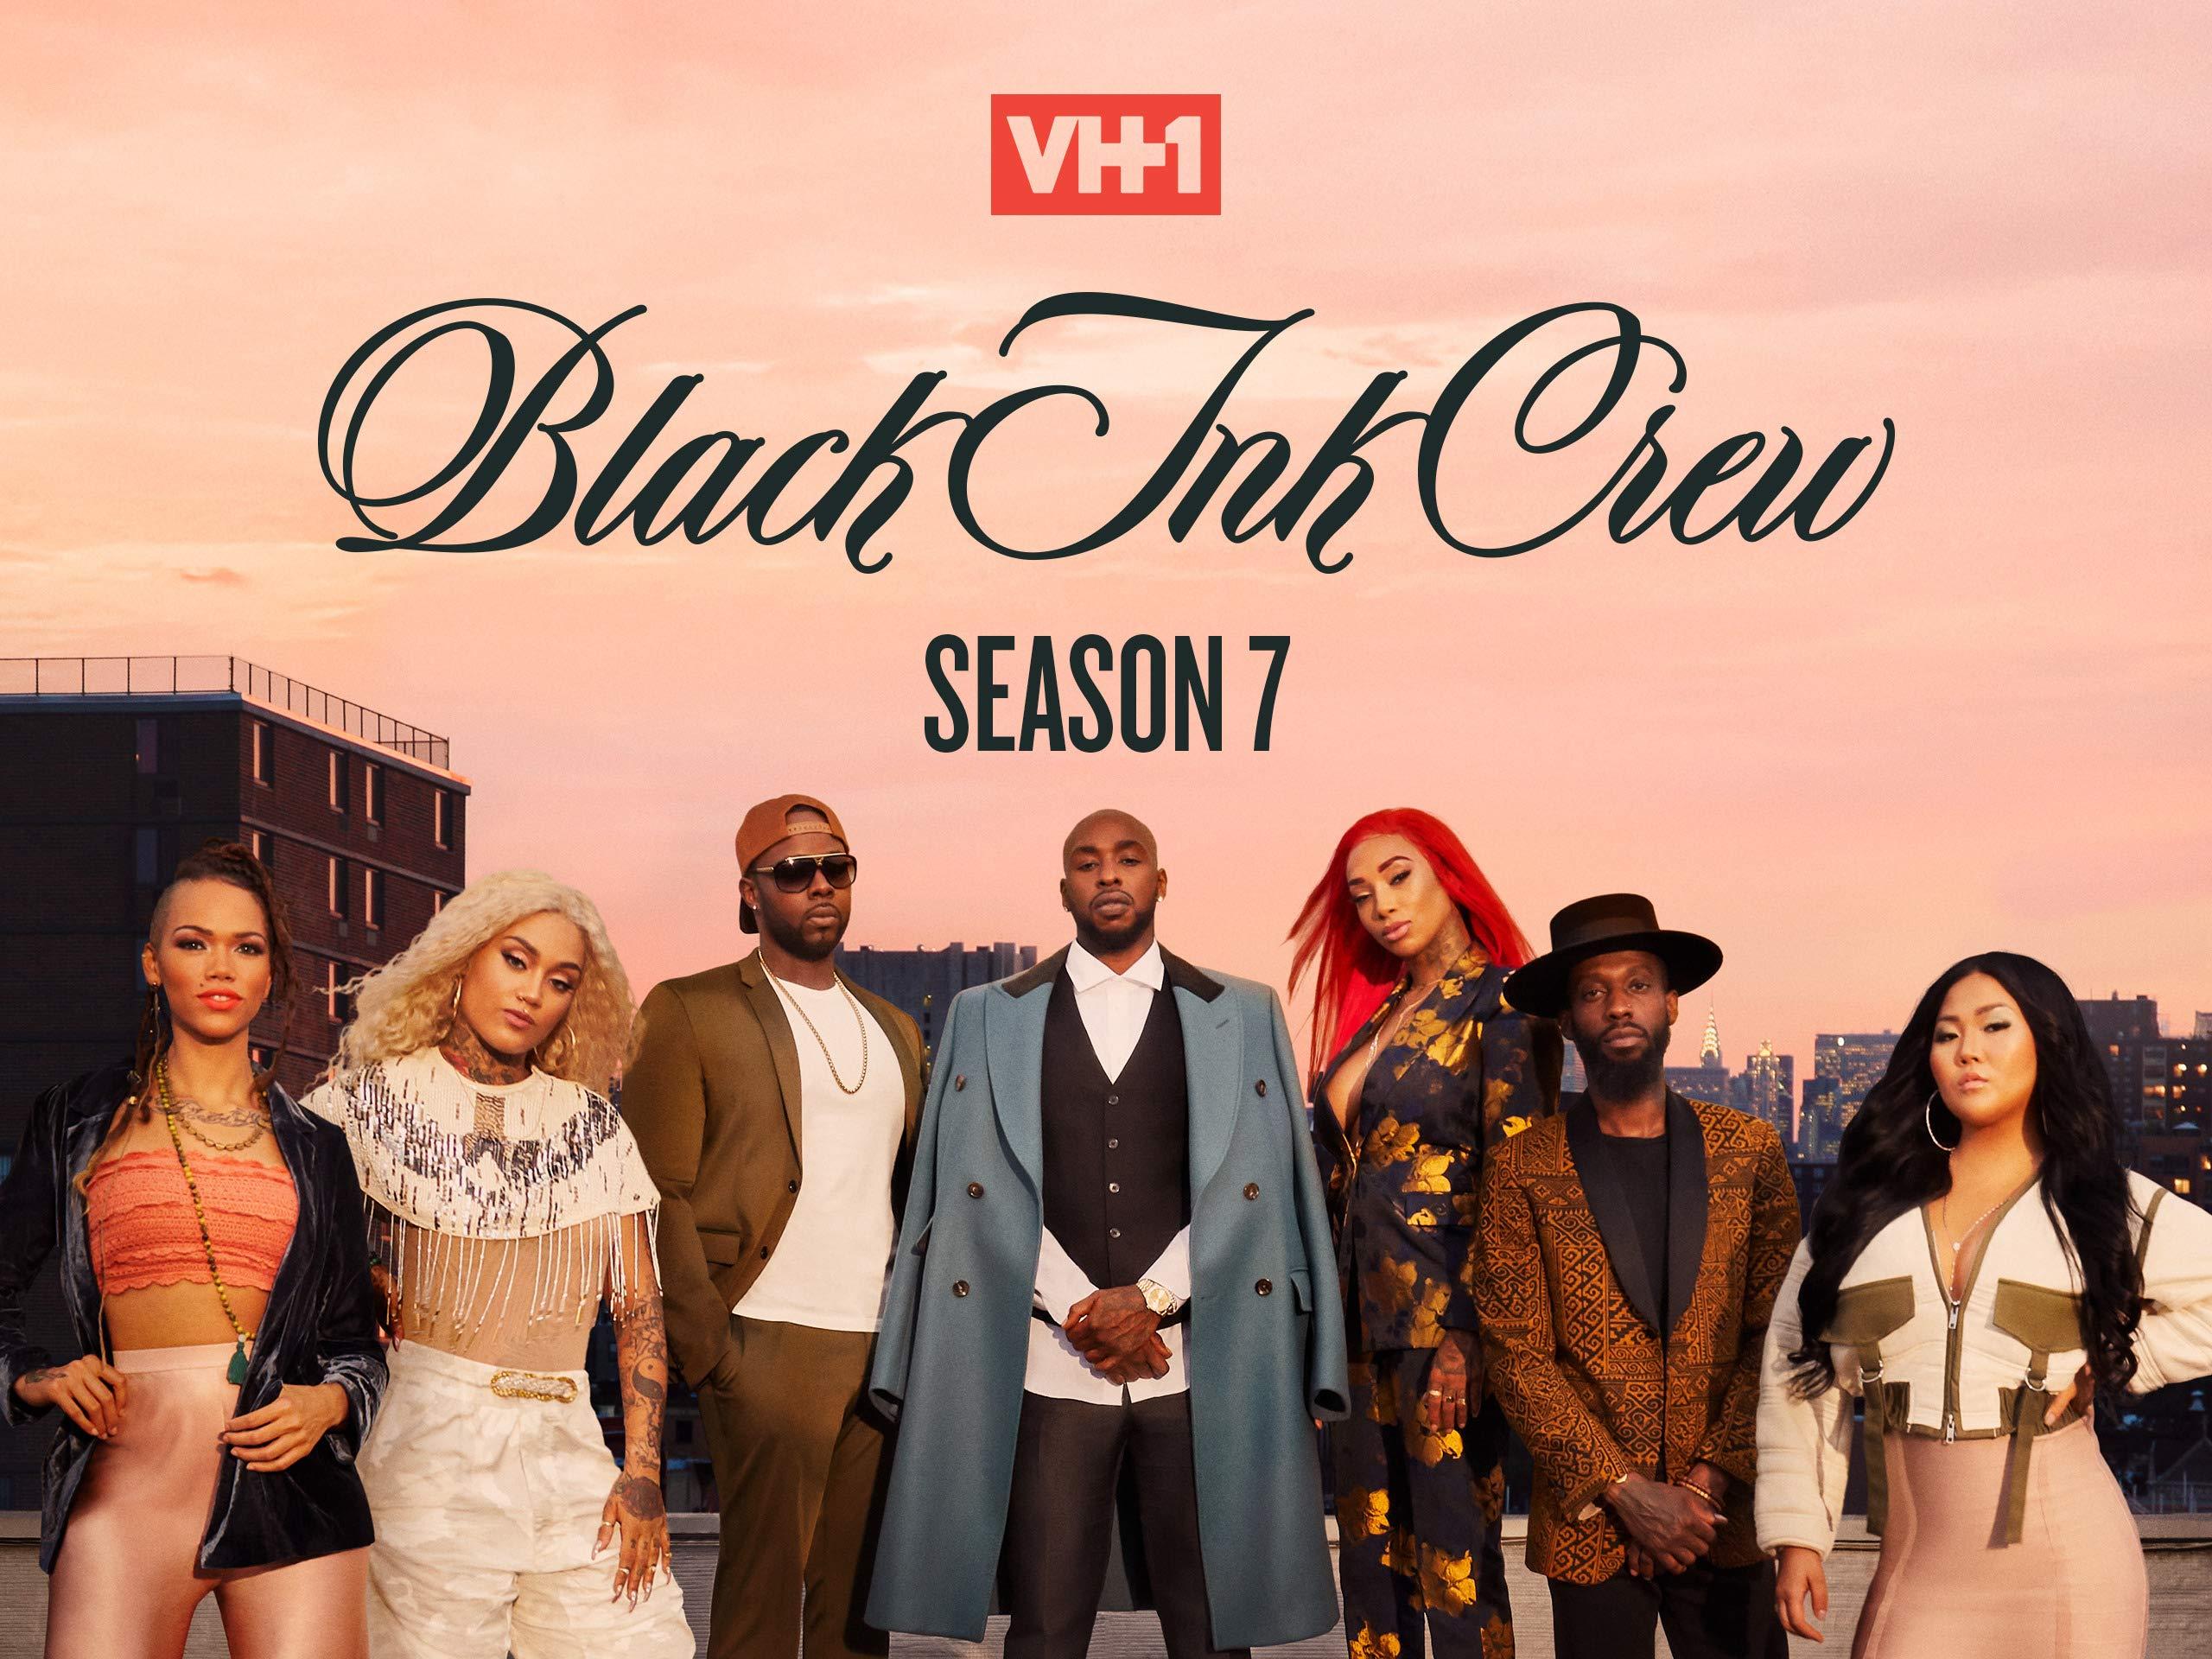 black ink crew season 7 episode 5 free